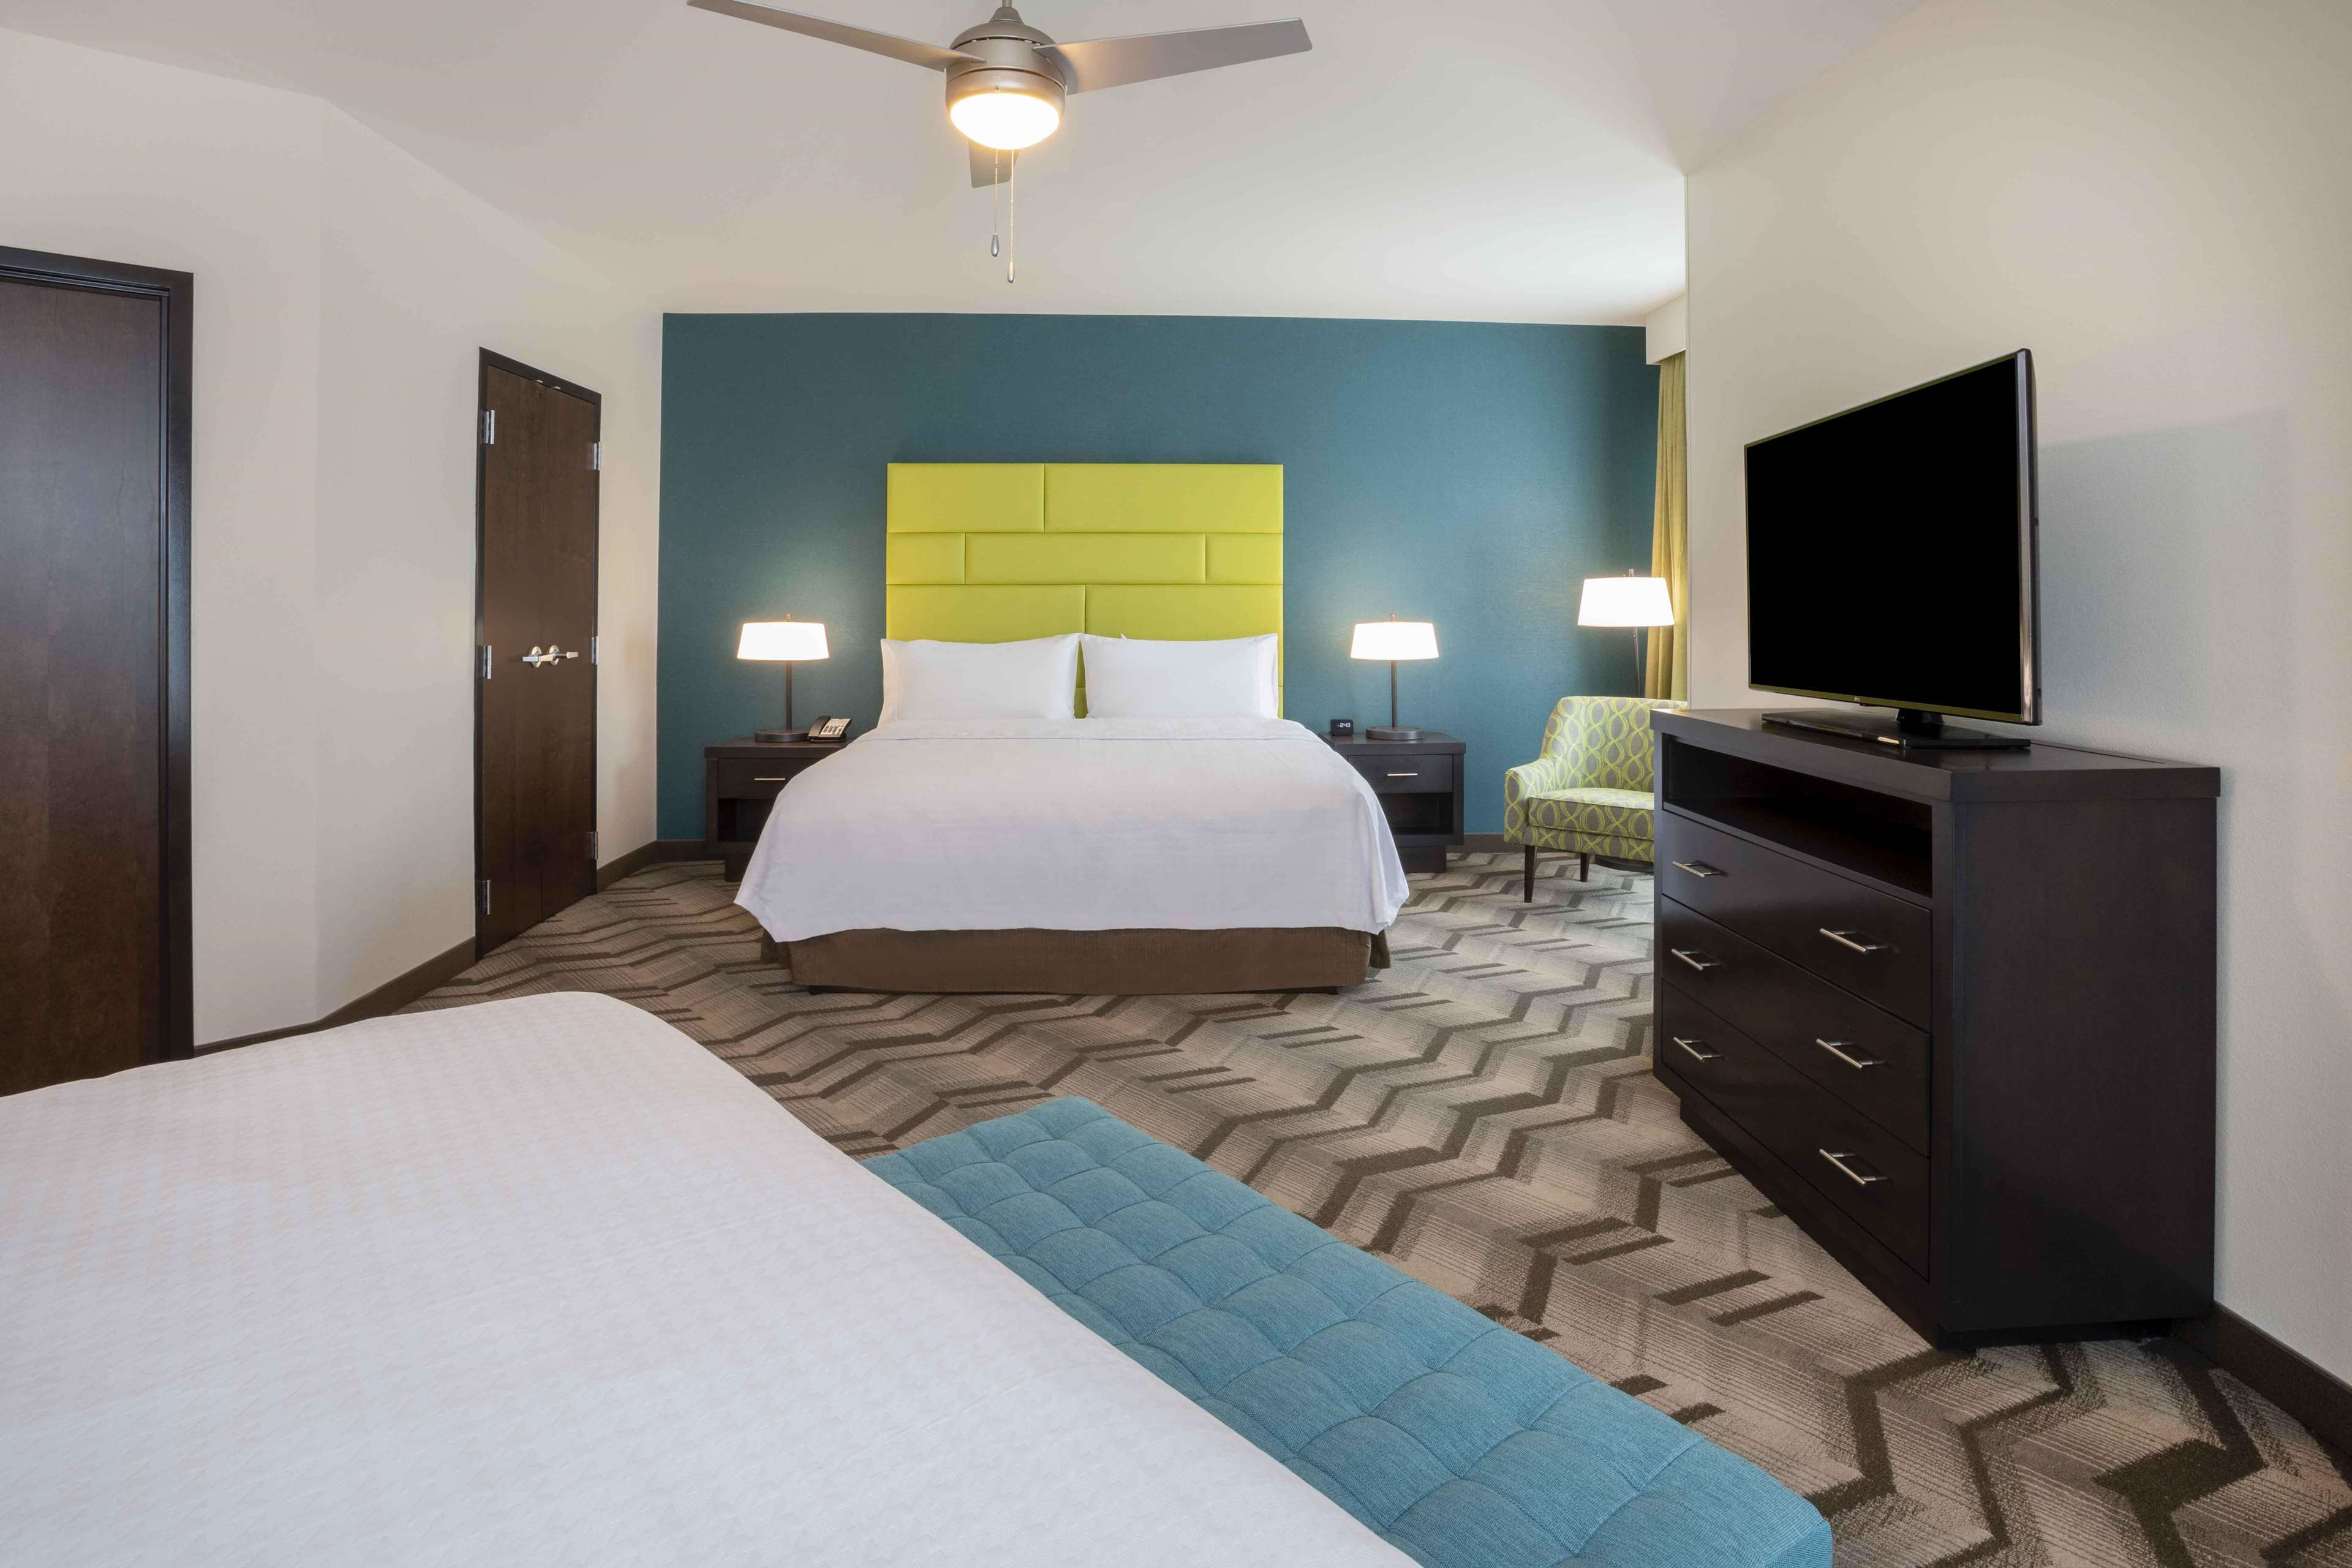 Homewood Suites by Hilton Edina Minneapolis image 29